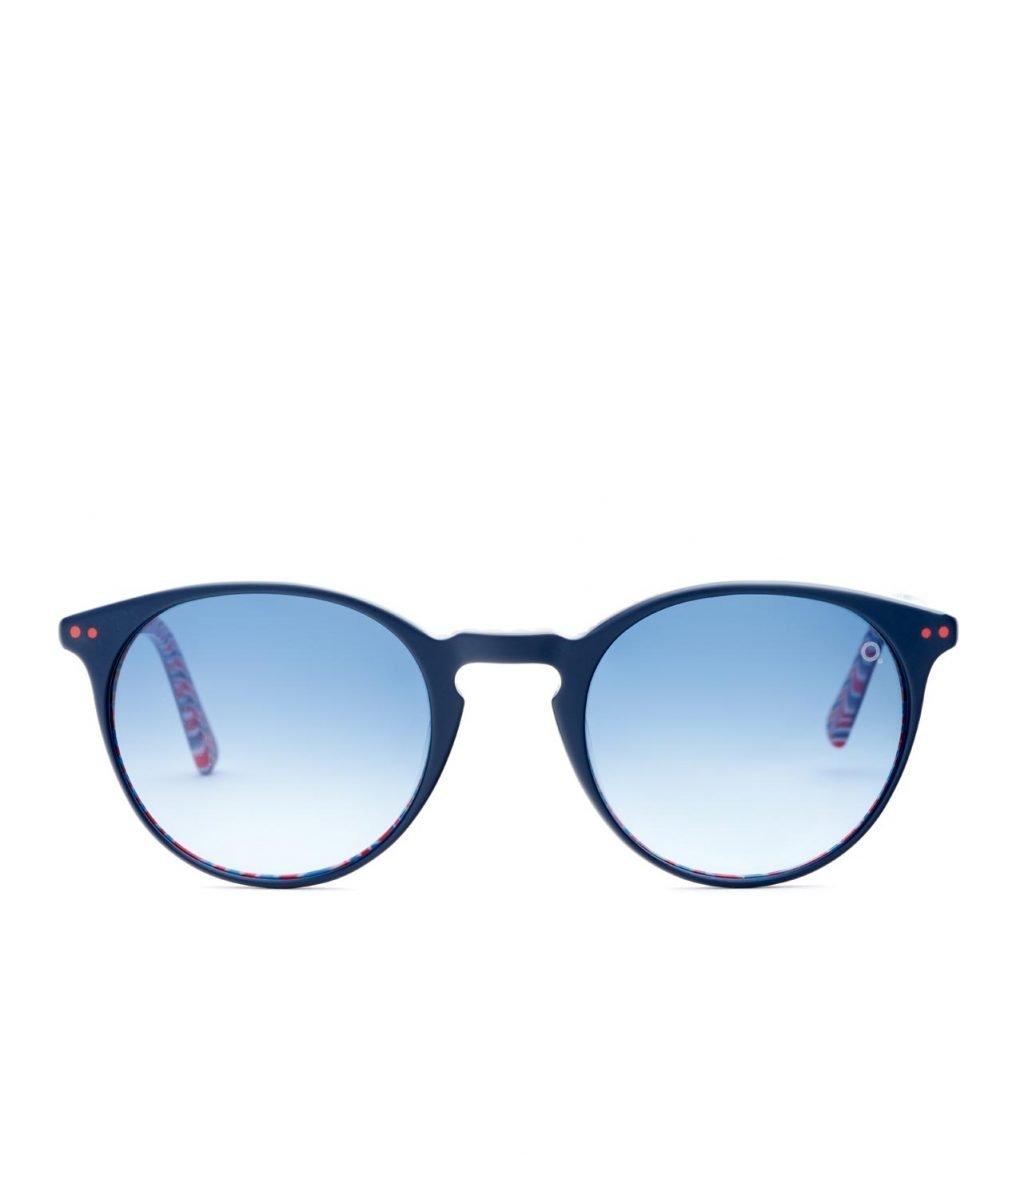 Jordaan sunglasses